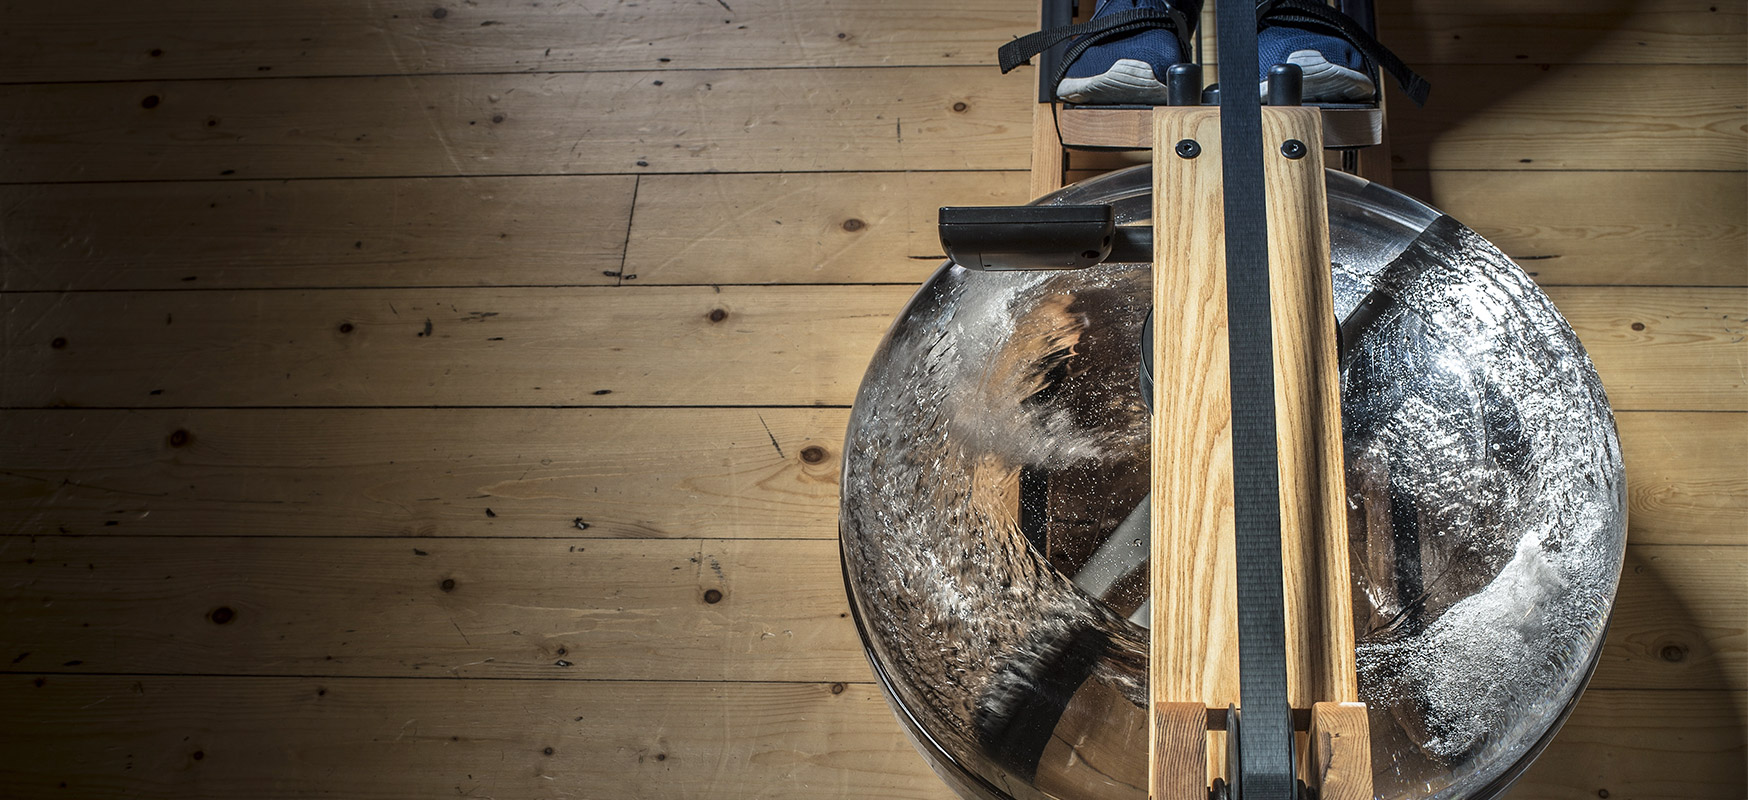 11 waterrower club rowing machine